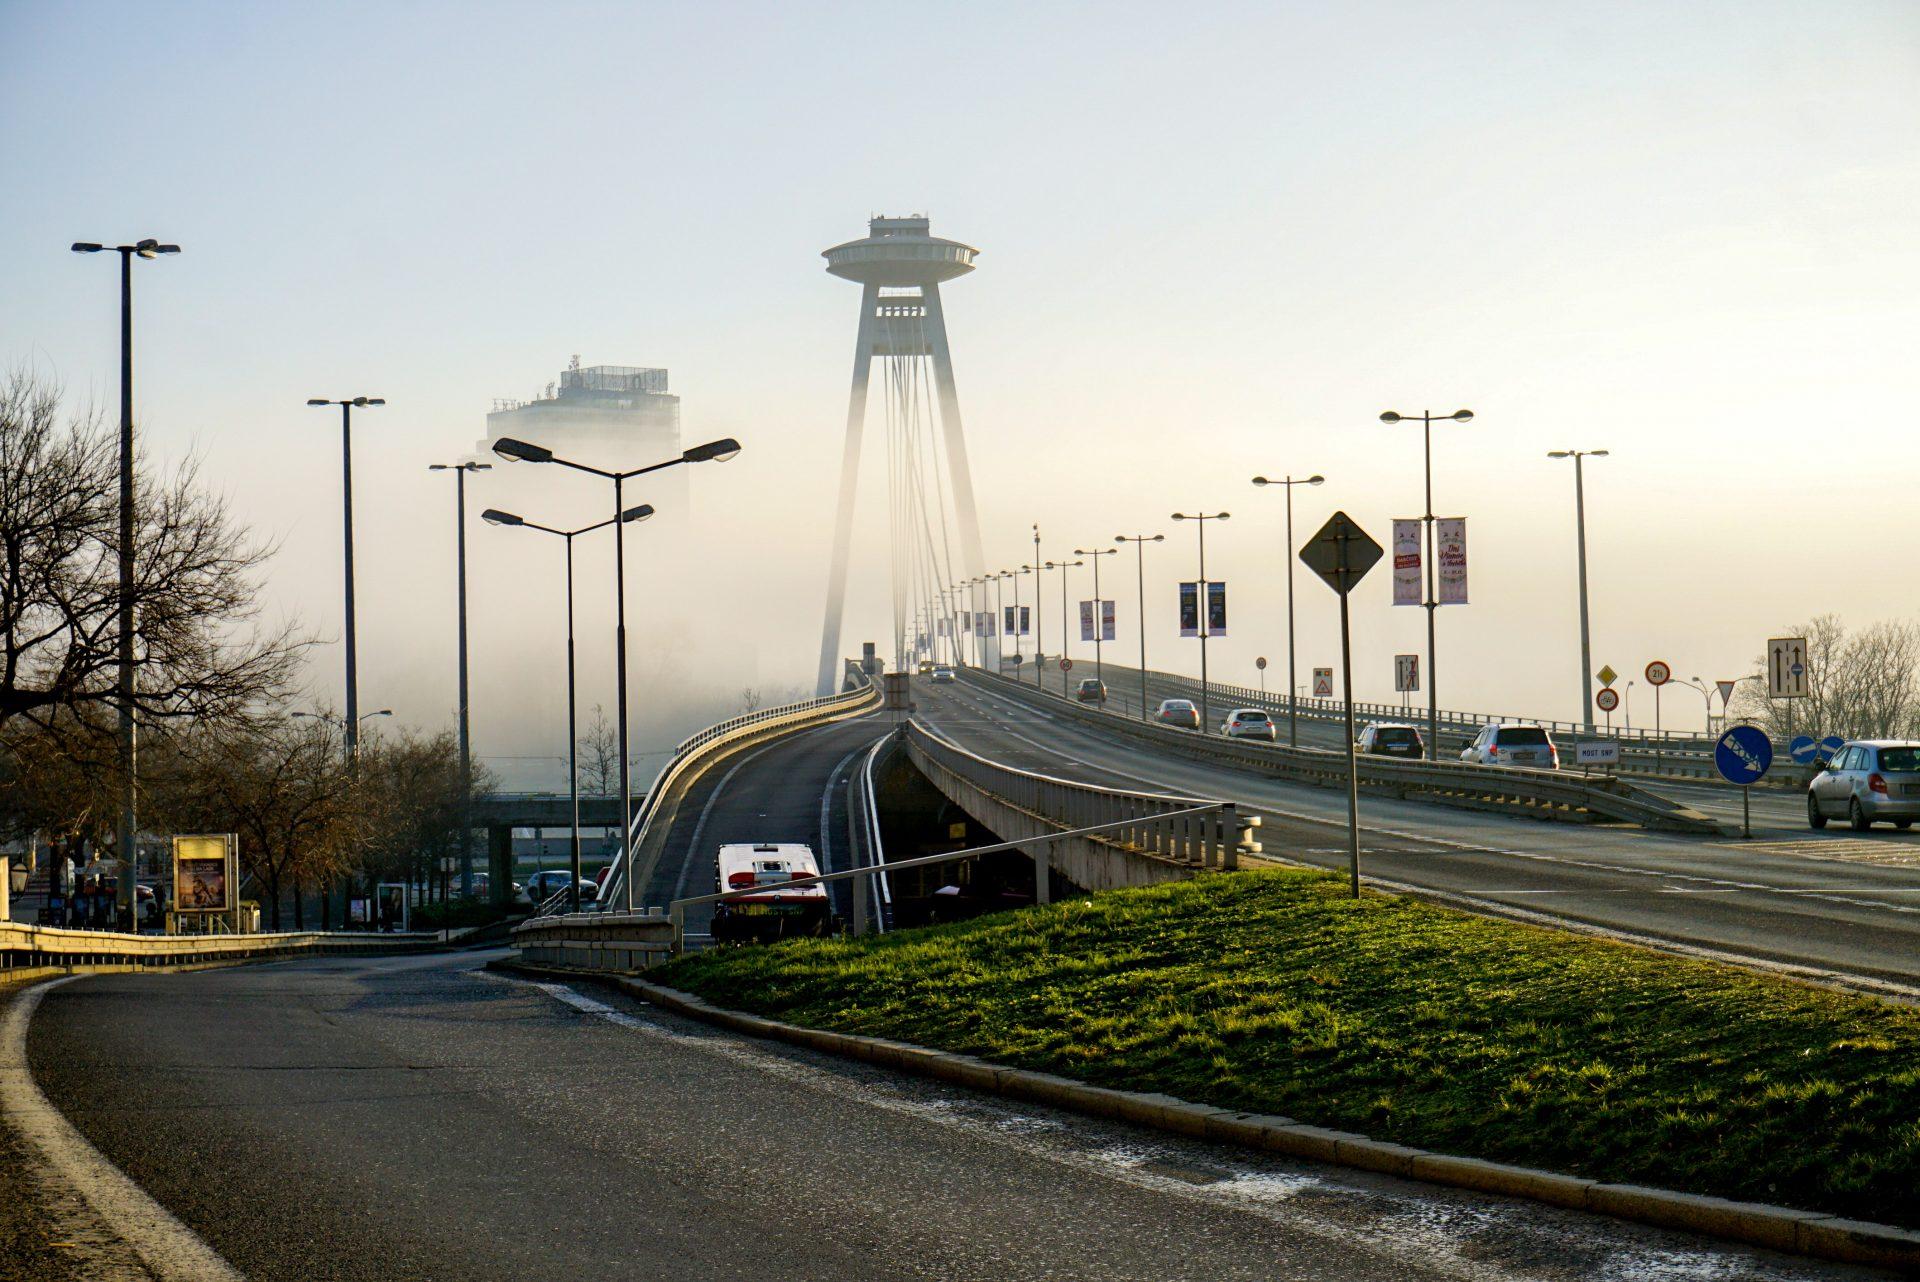 Tower Bratislava Slovakia – Experiencing the Globe